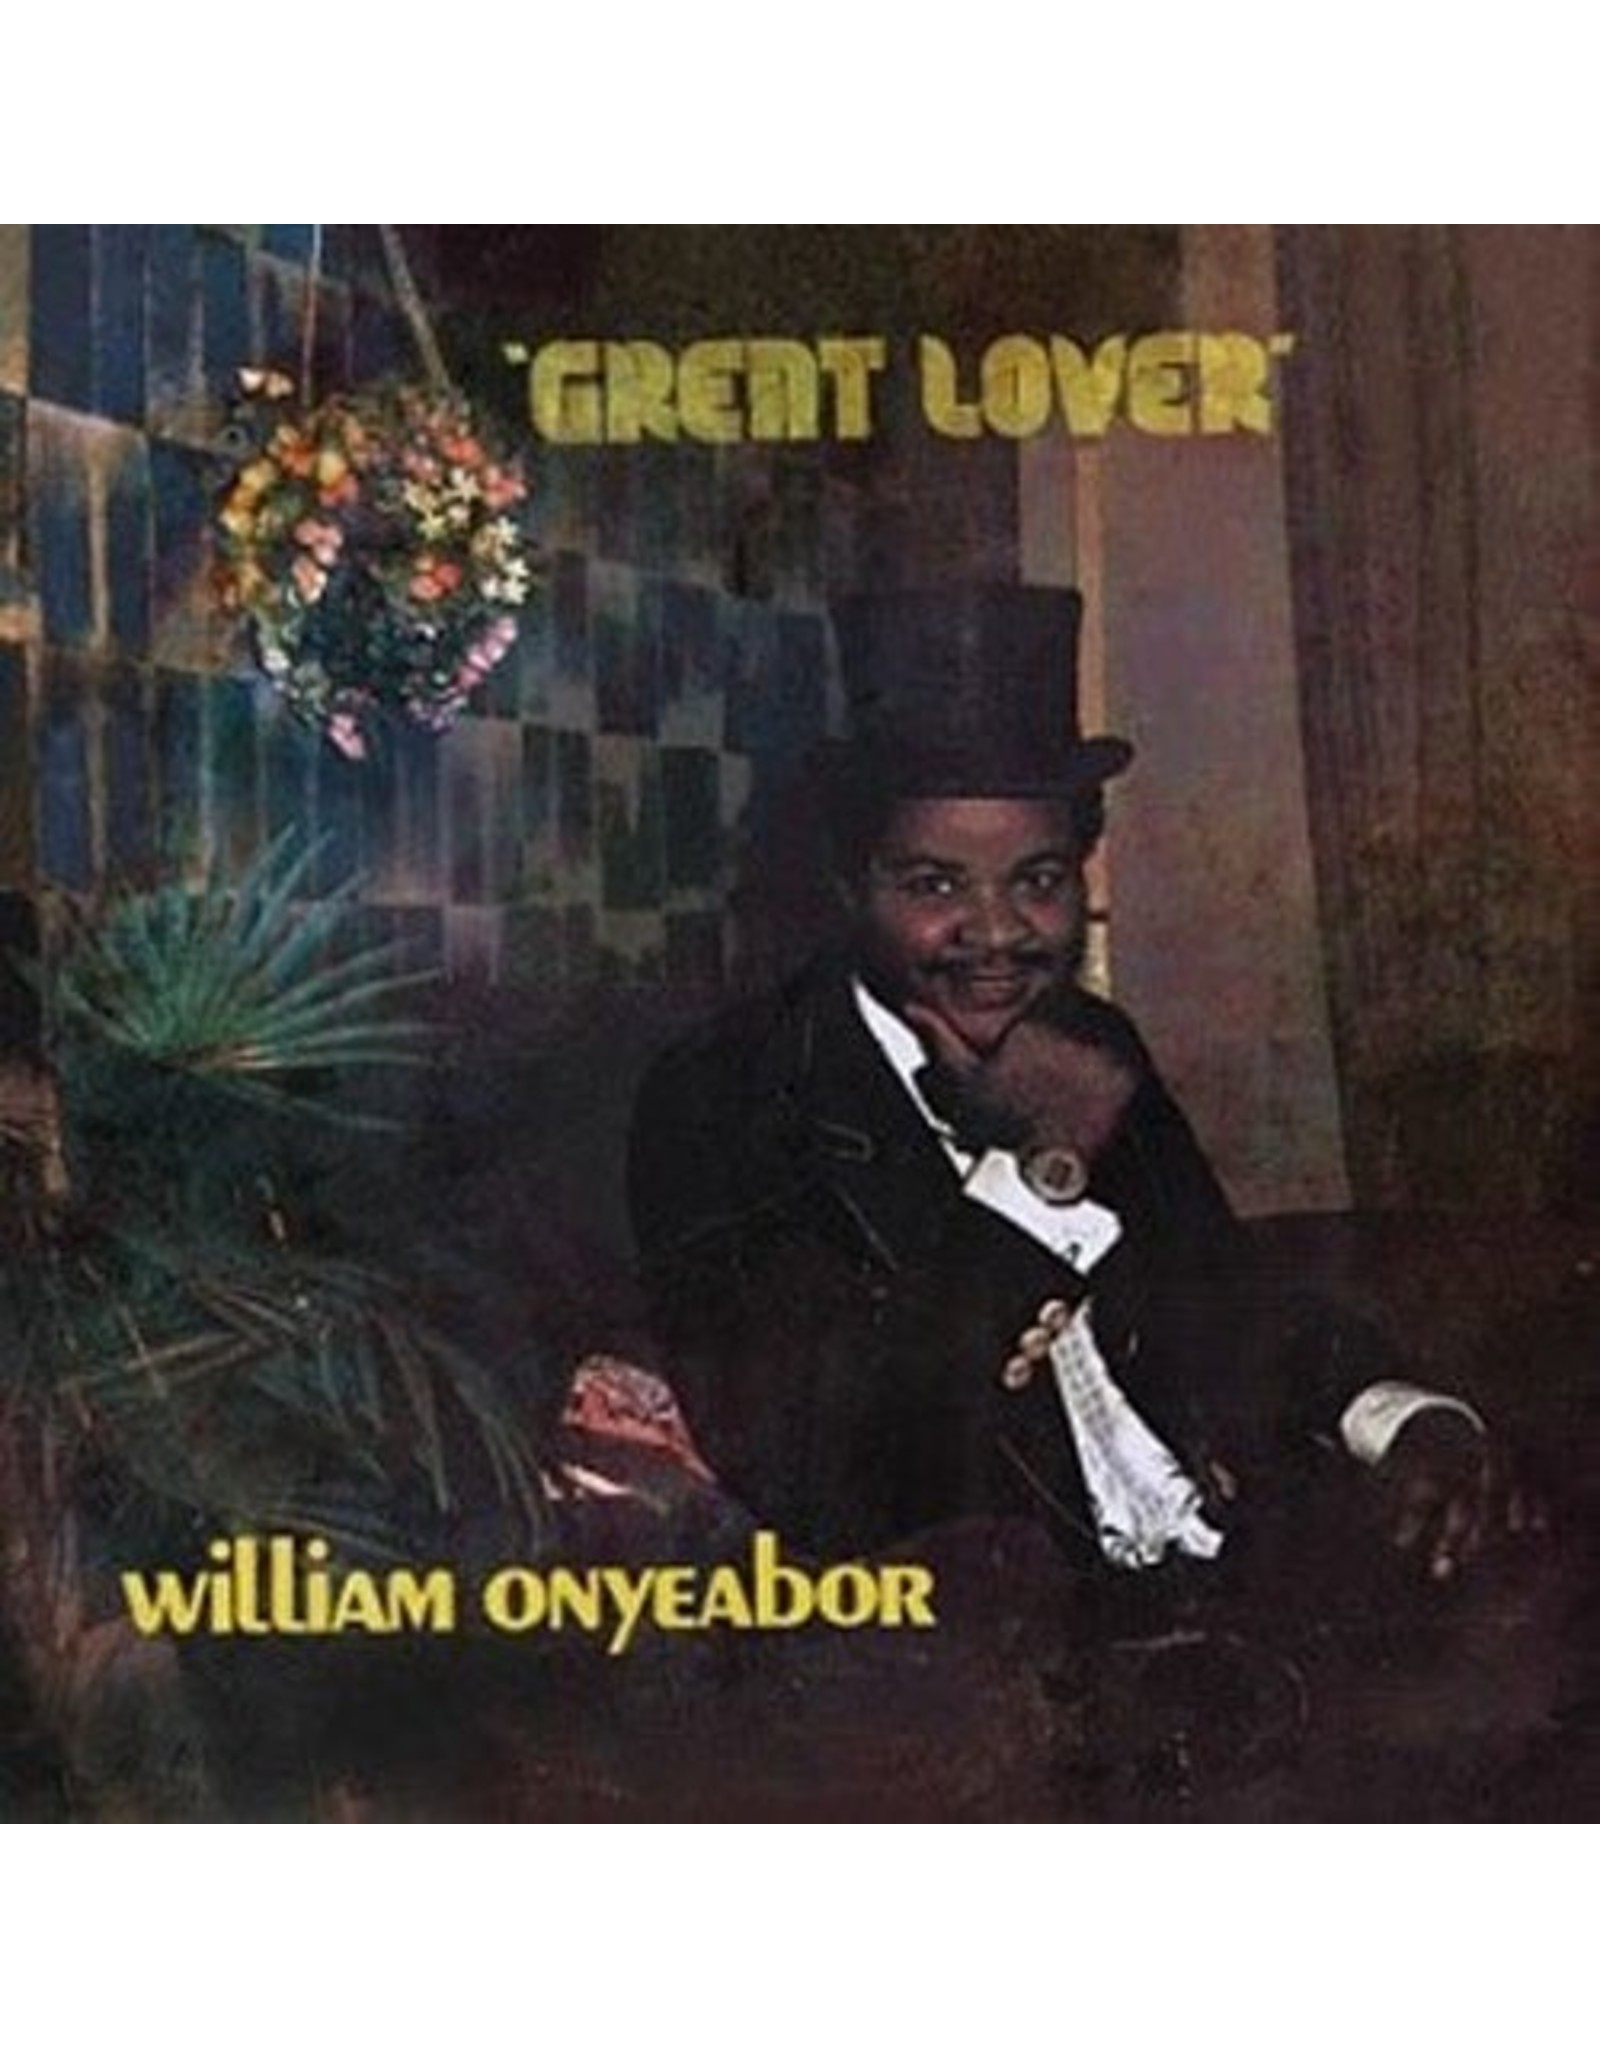 New Vinyl William Onyeabor - Great Lover LP